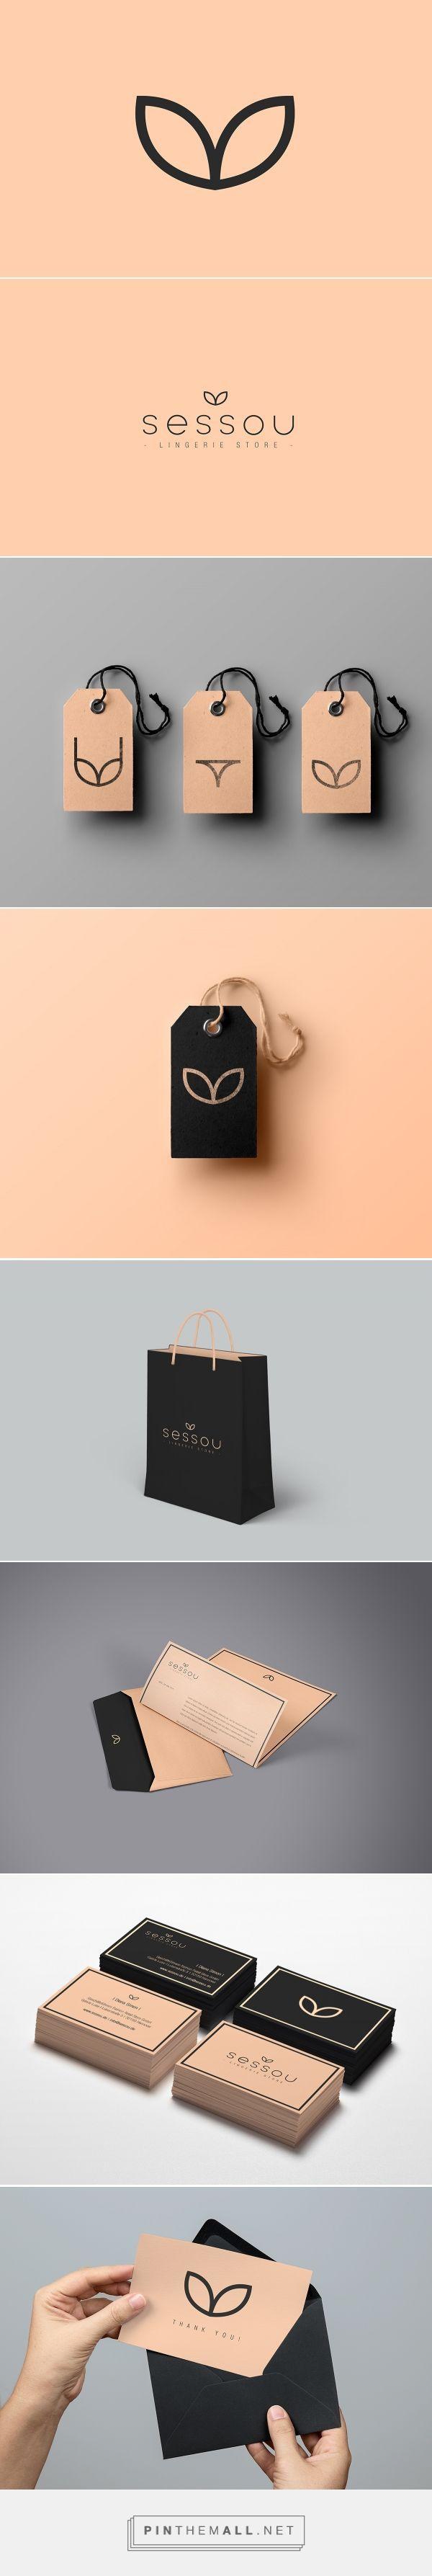 Sessou Lingerie Branding by Andrea Cutura